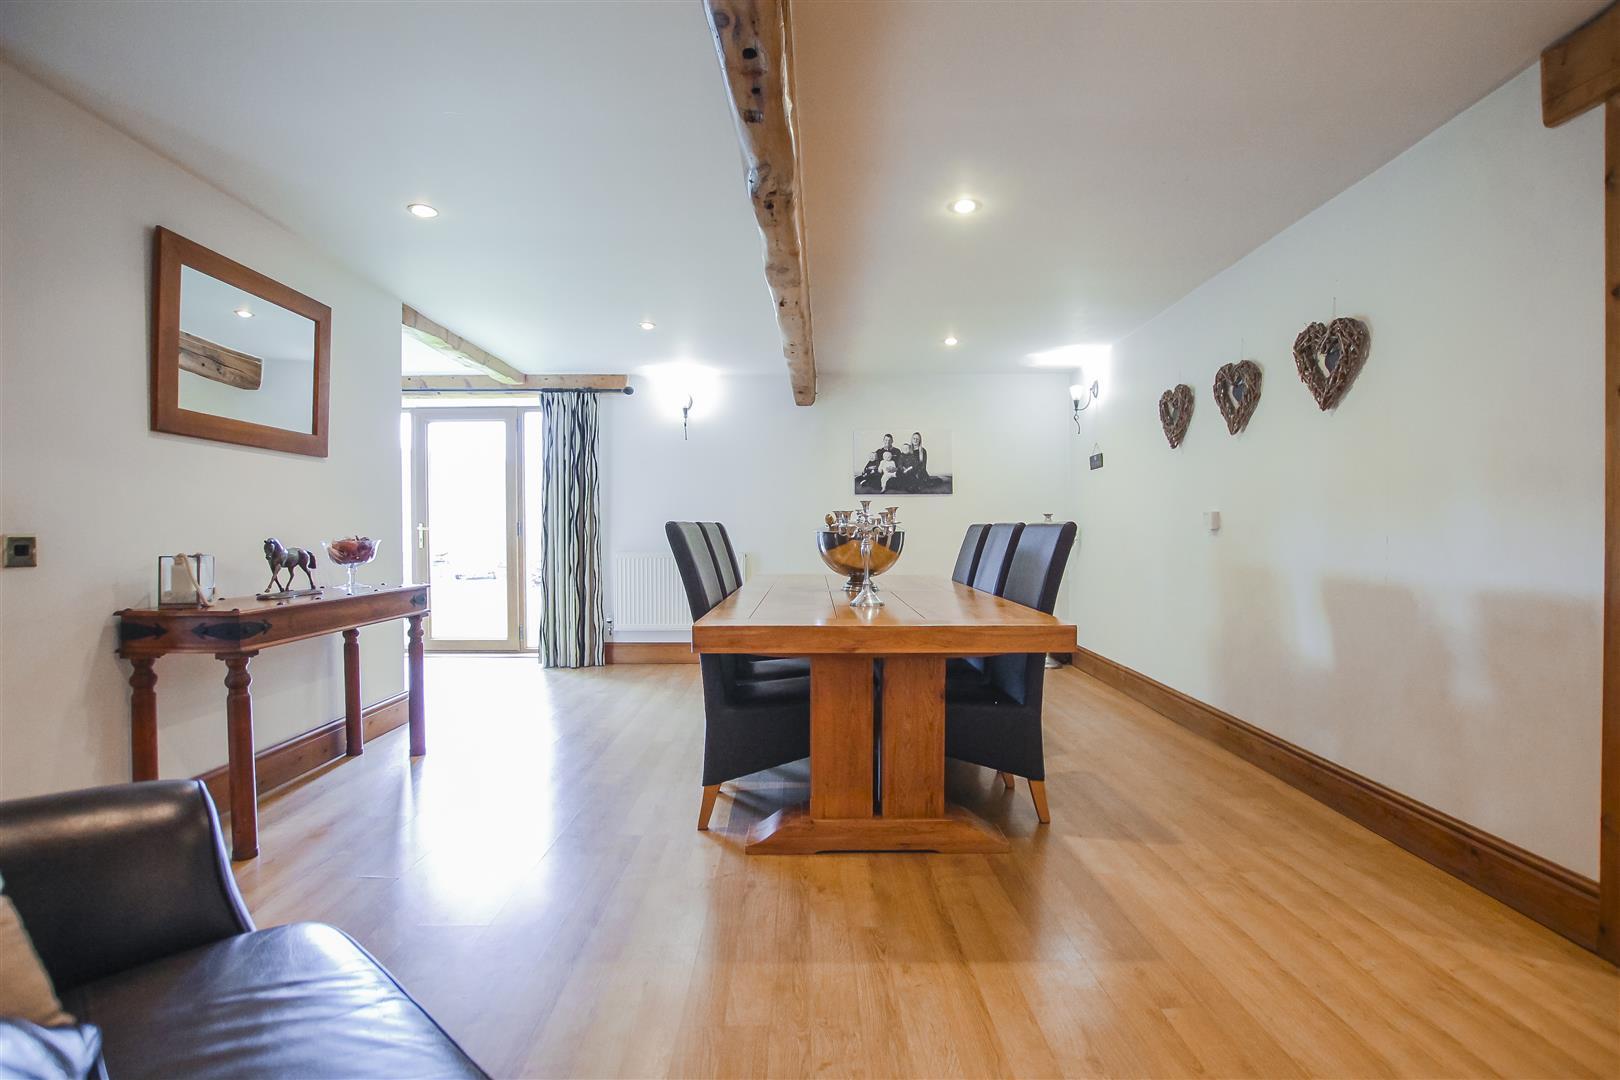 4 Bedroom Semi-detached House For Sale - Image 48